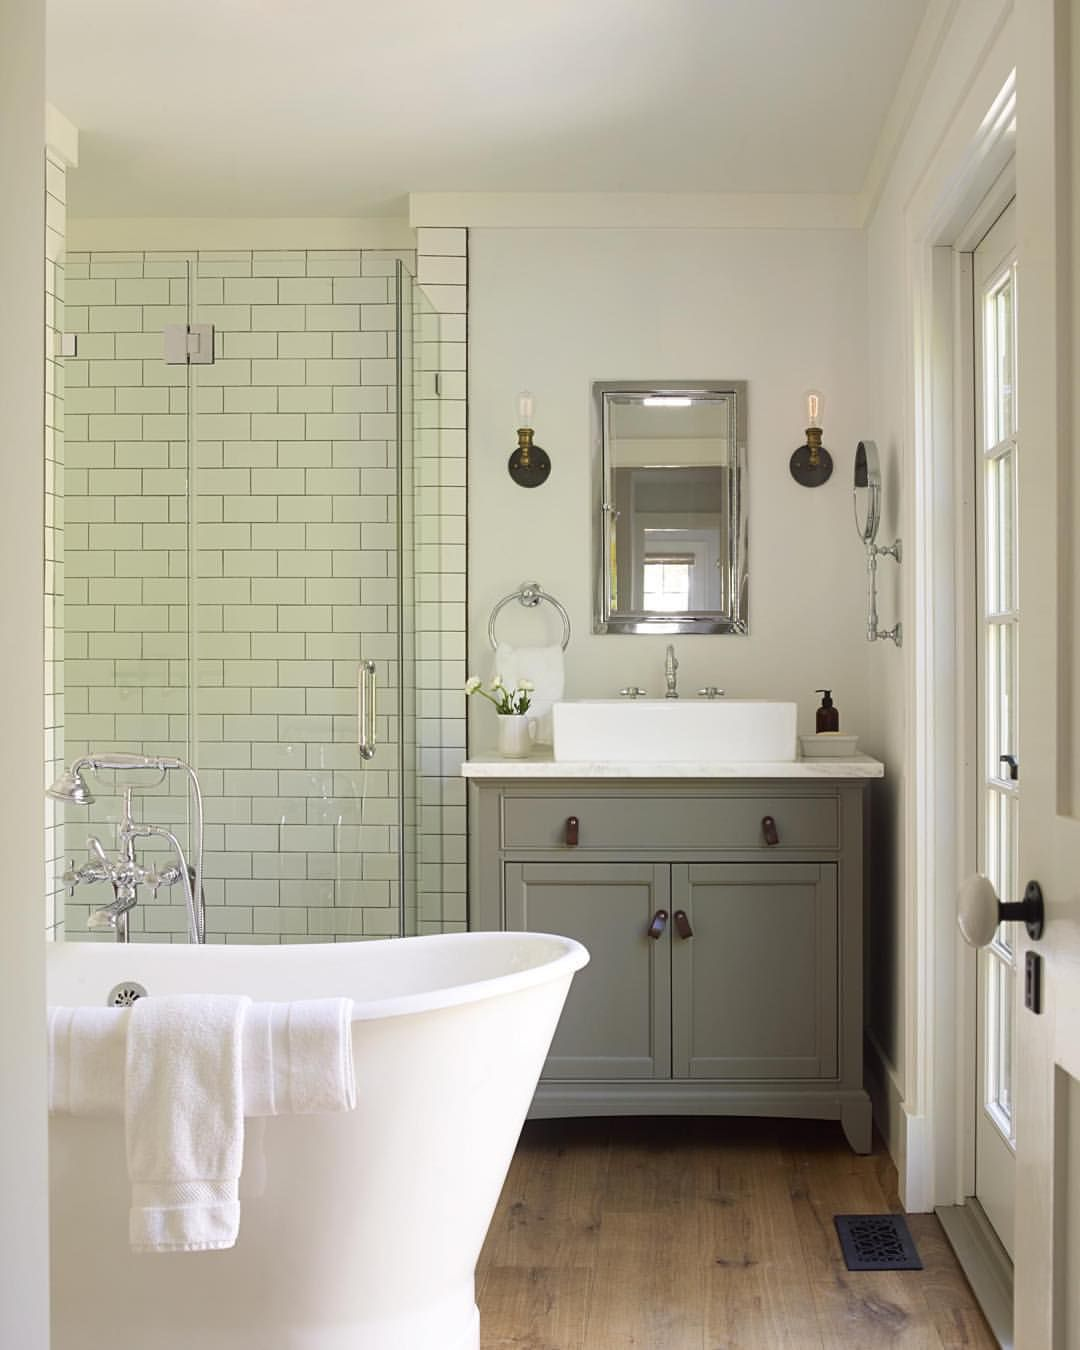 Metro tiles, sink vanity unit chest of drawers, roll top bath ...